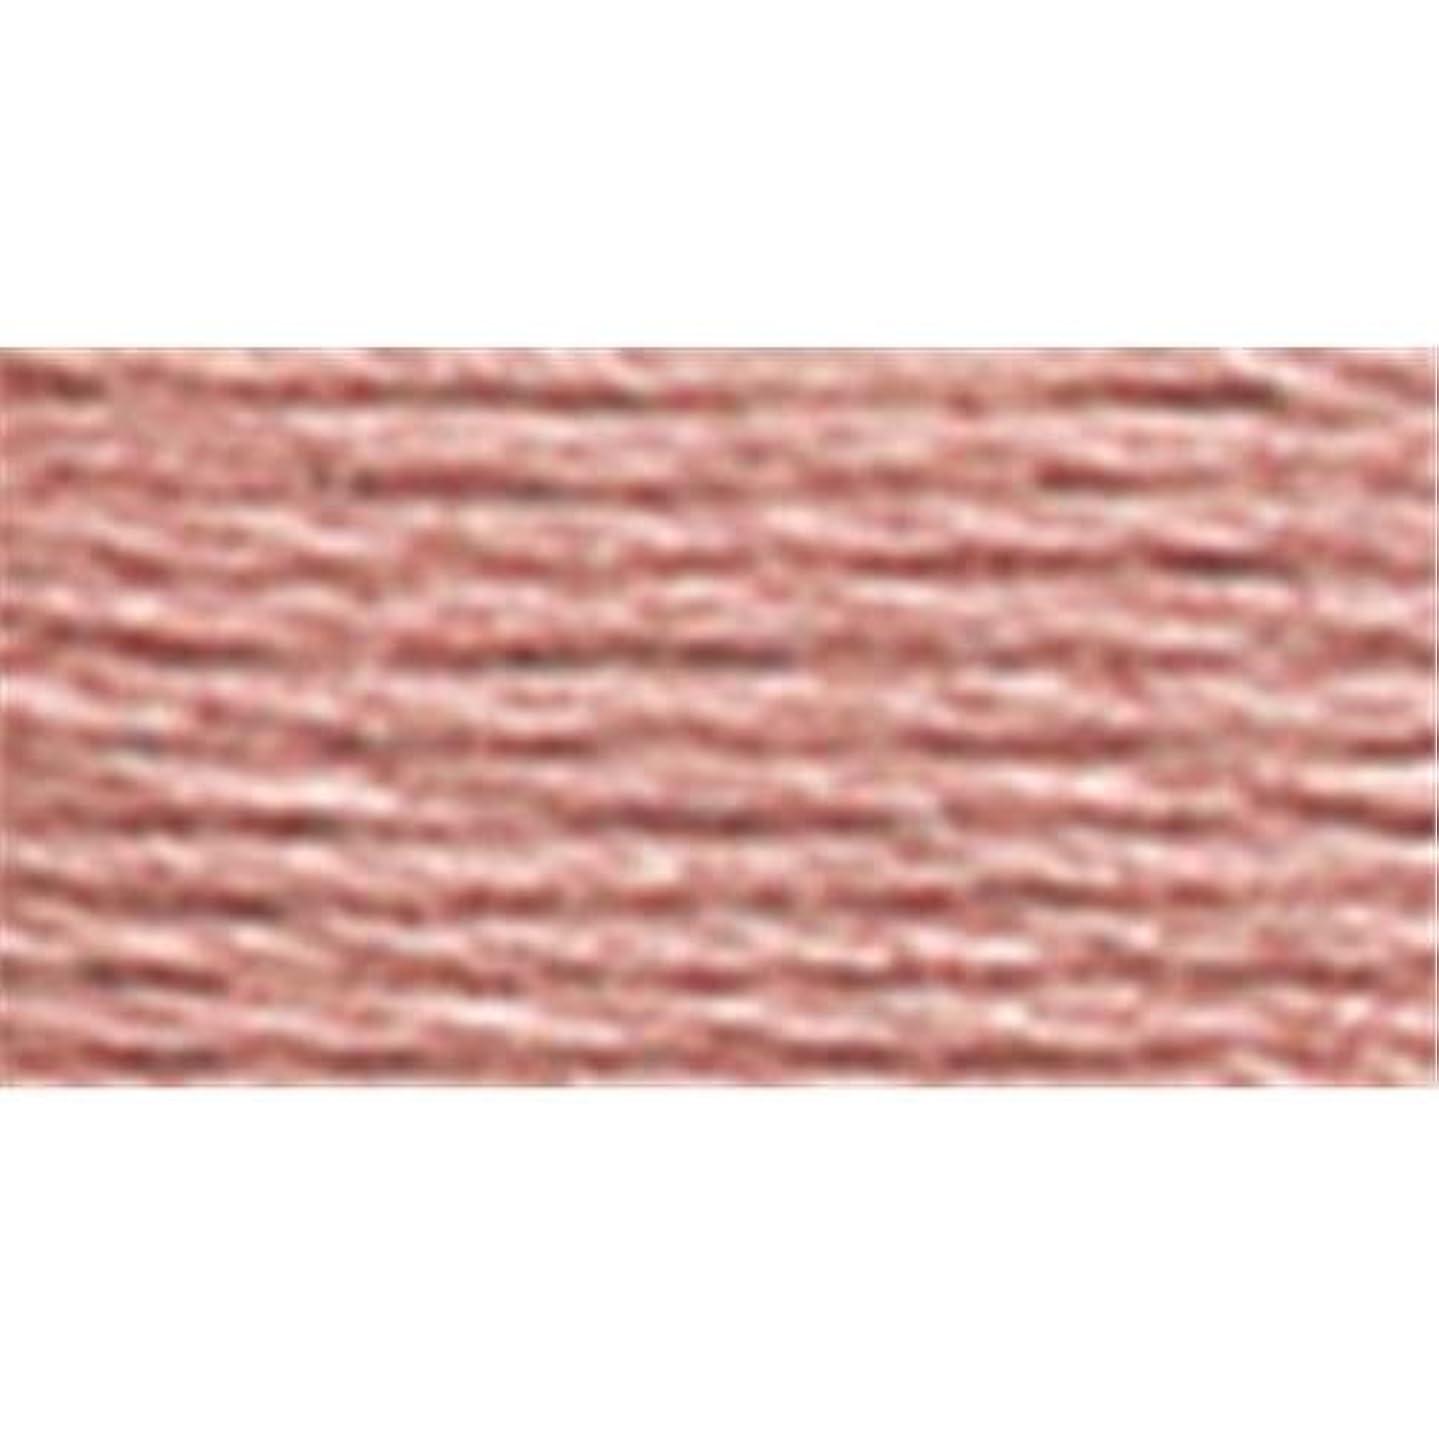 DMC 115 3-224 Pearl Cotton Thread, Very Light Shell Pink